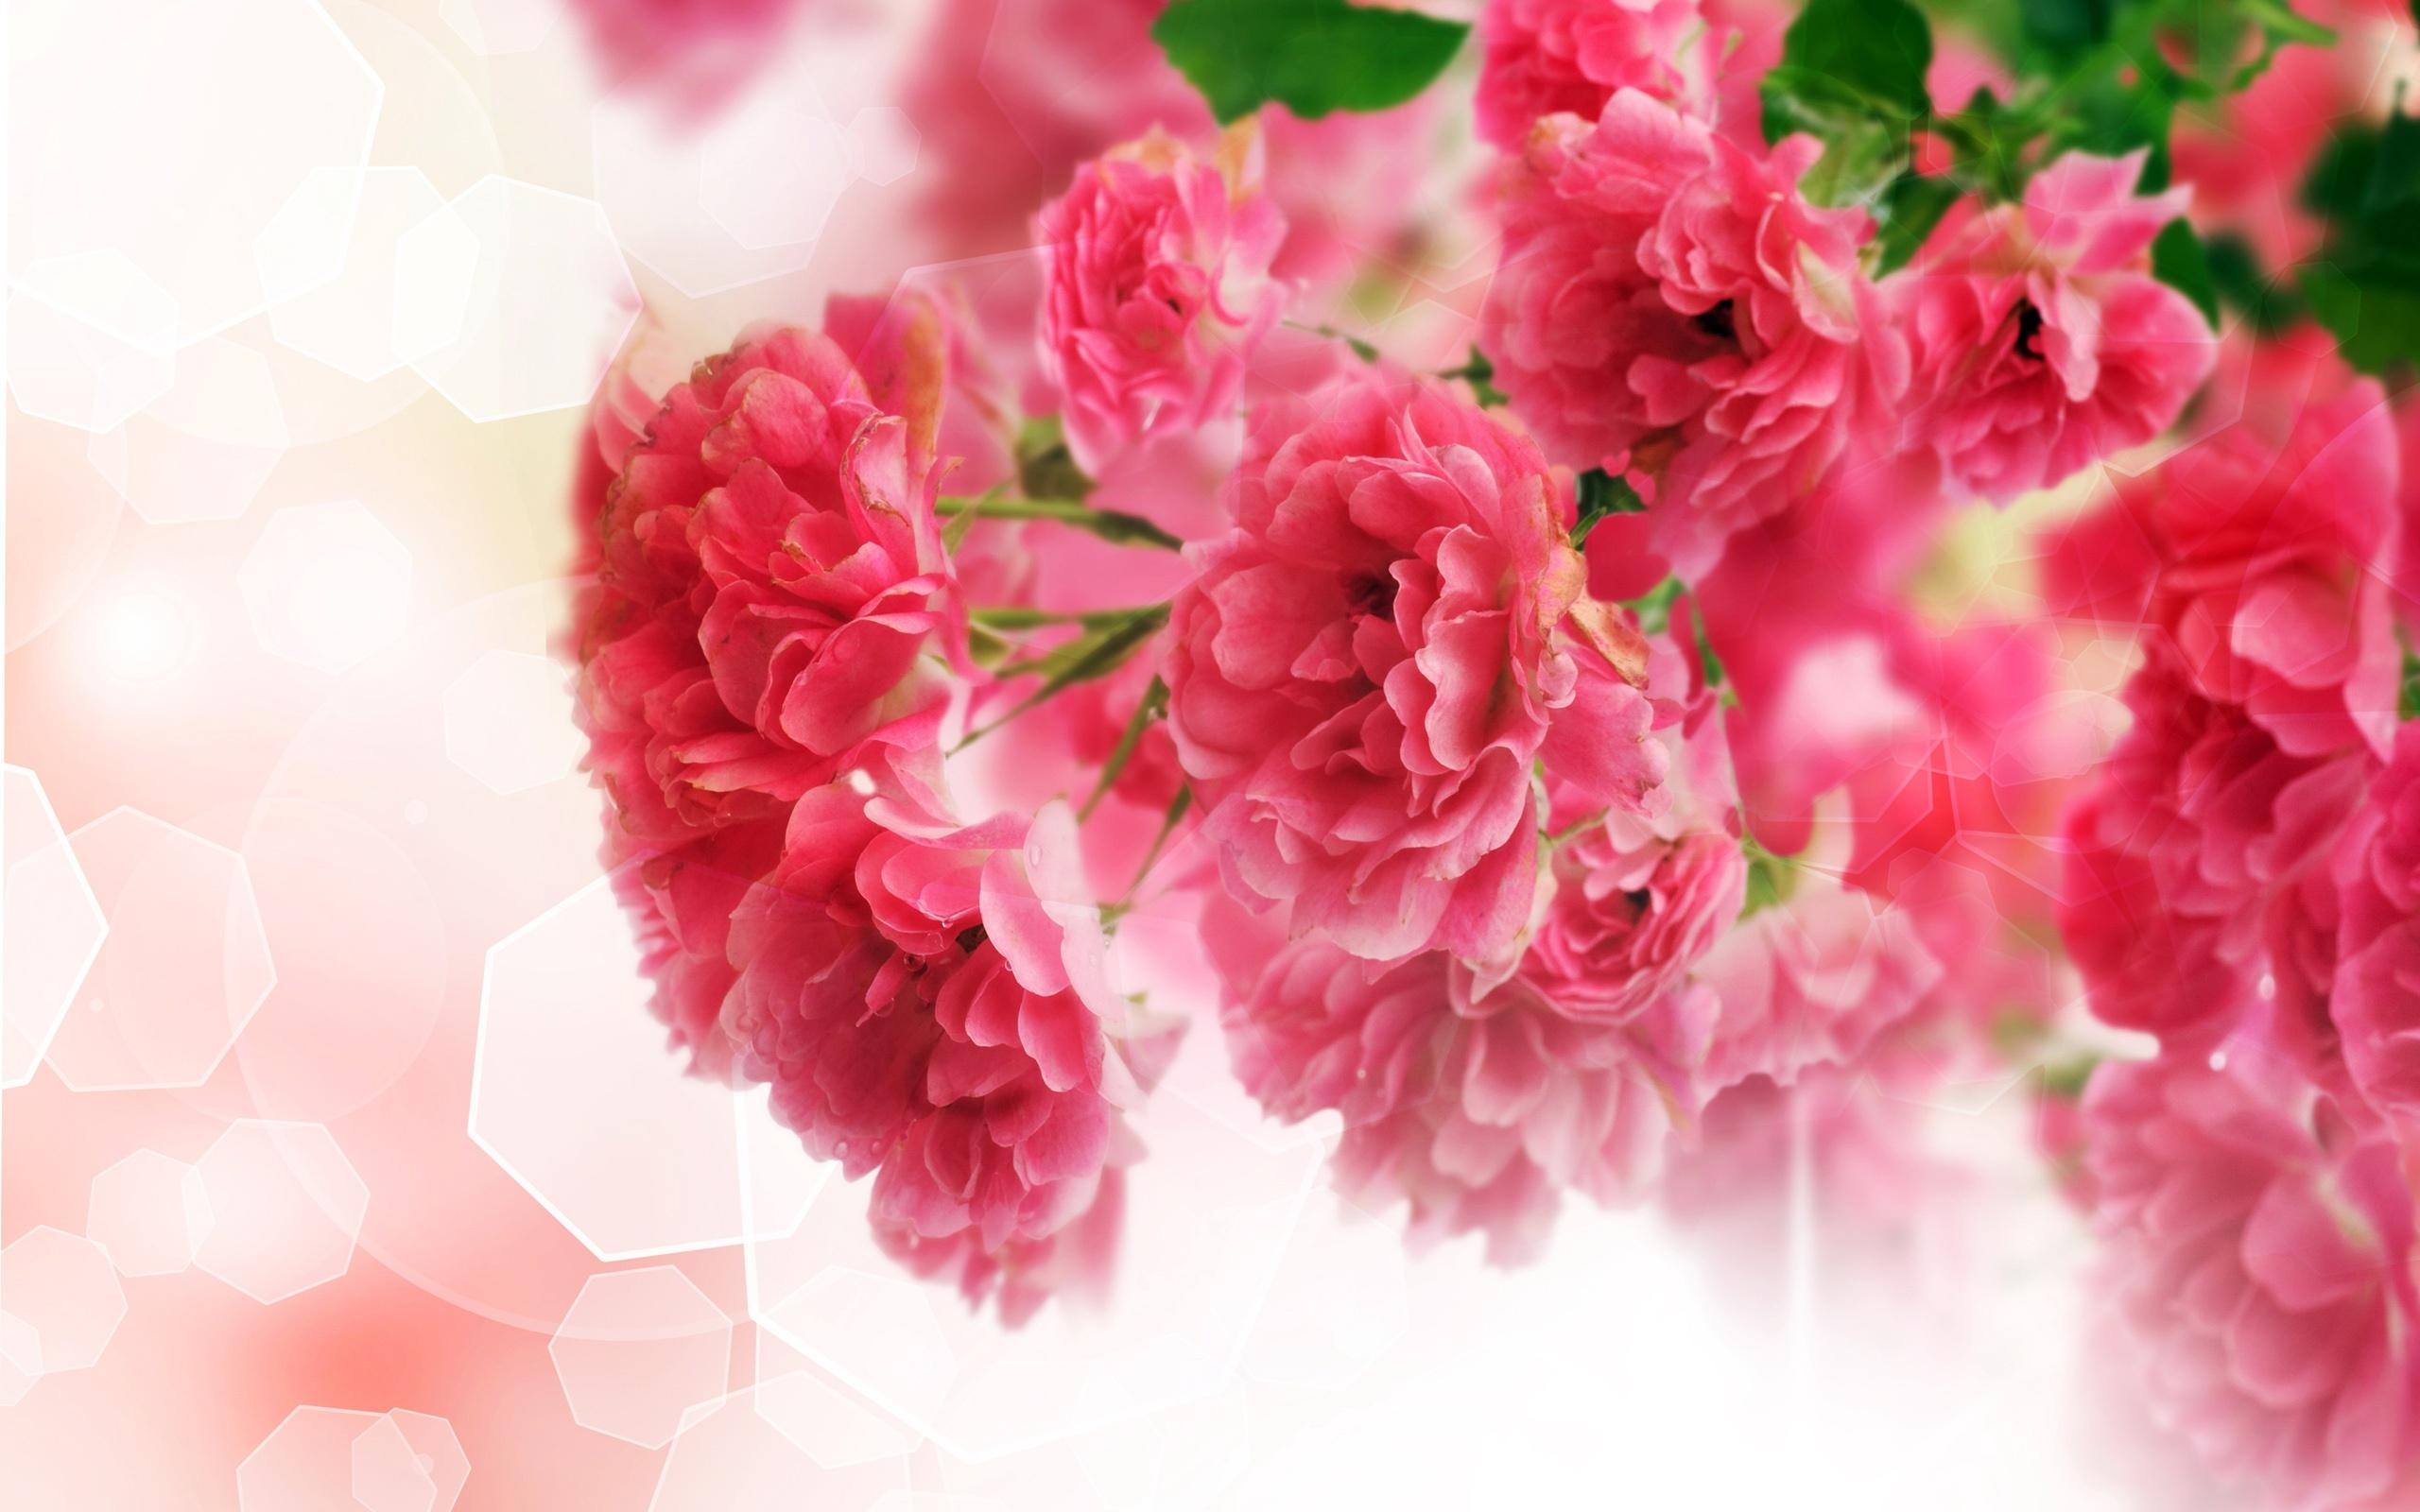 carnation photo